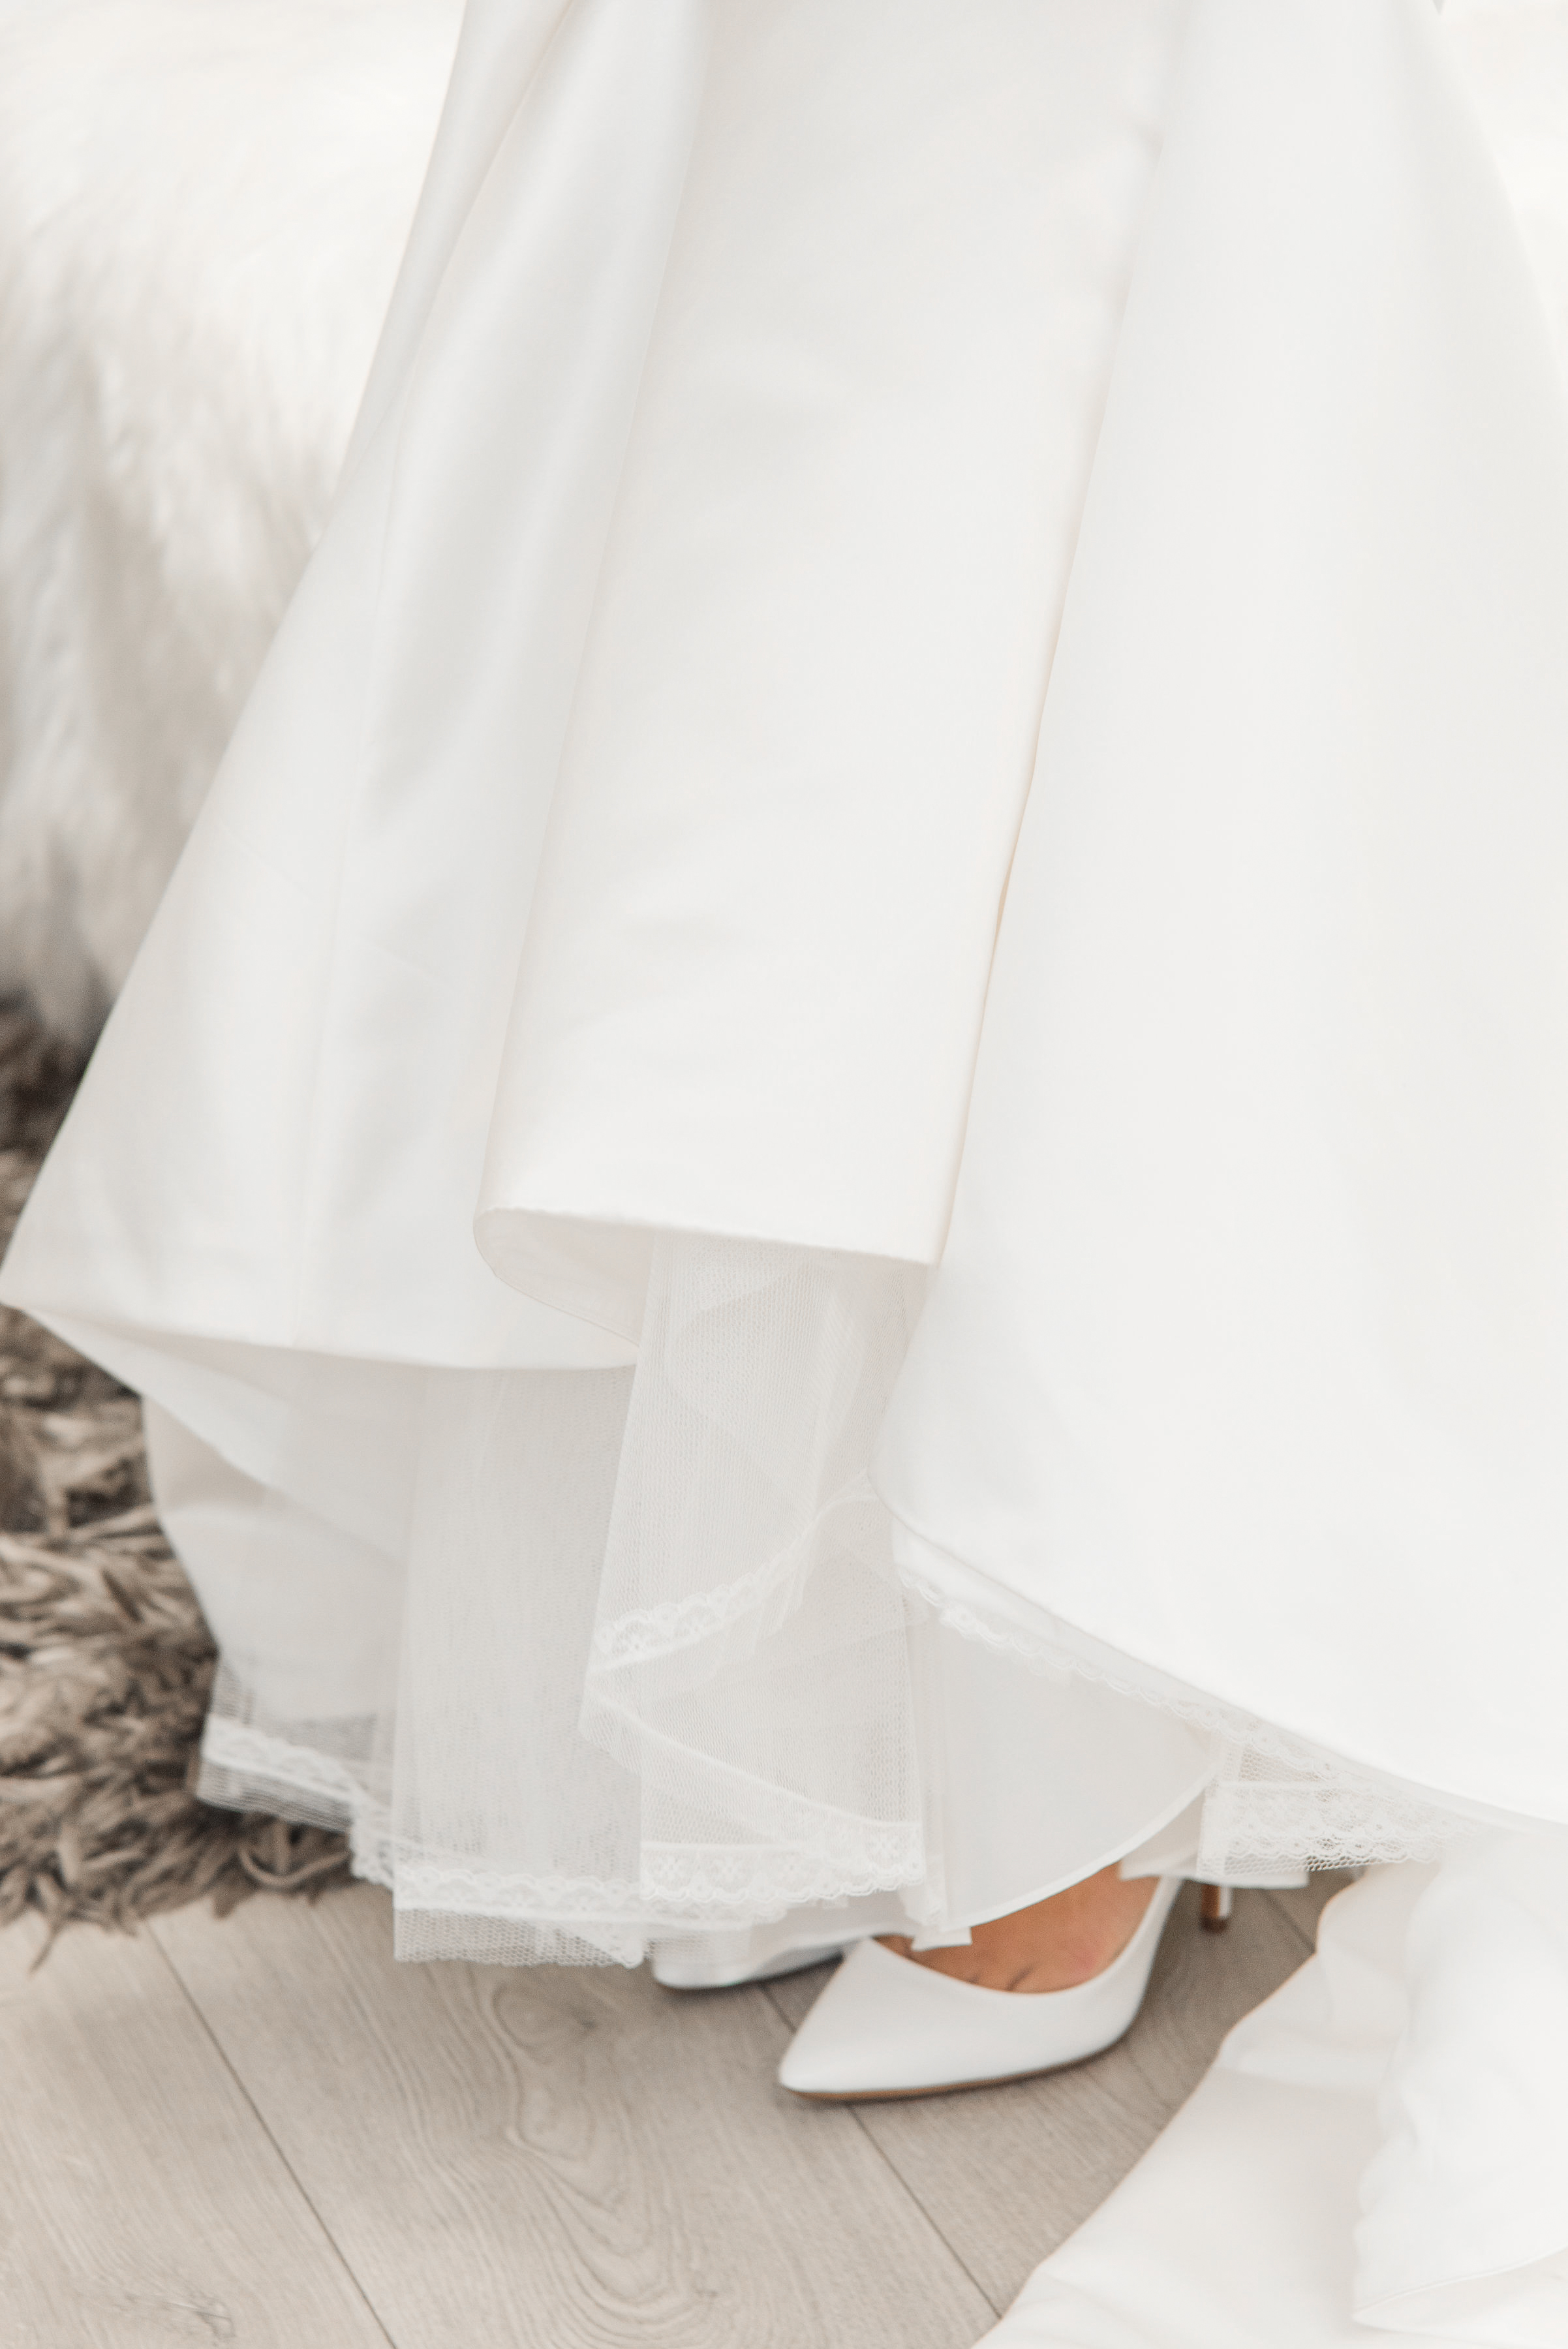 weddingfaves-94.jpg